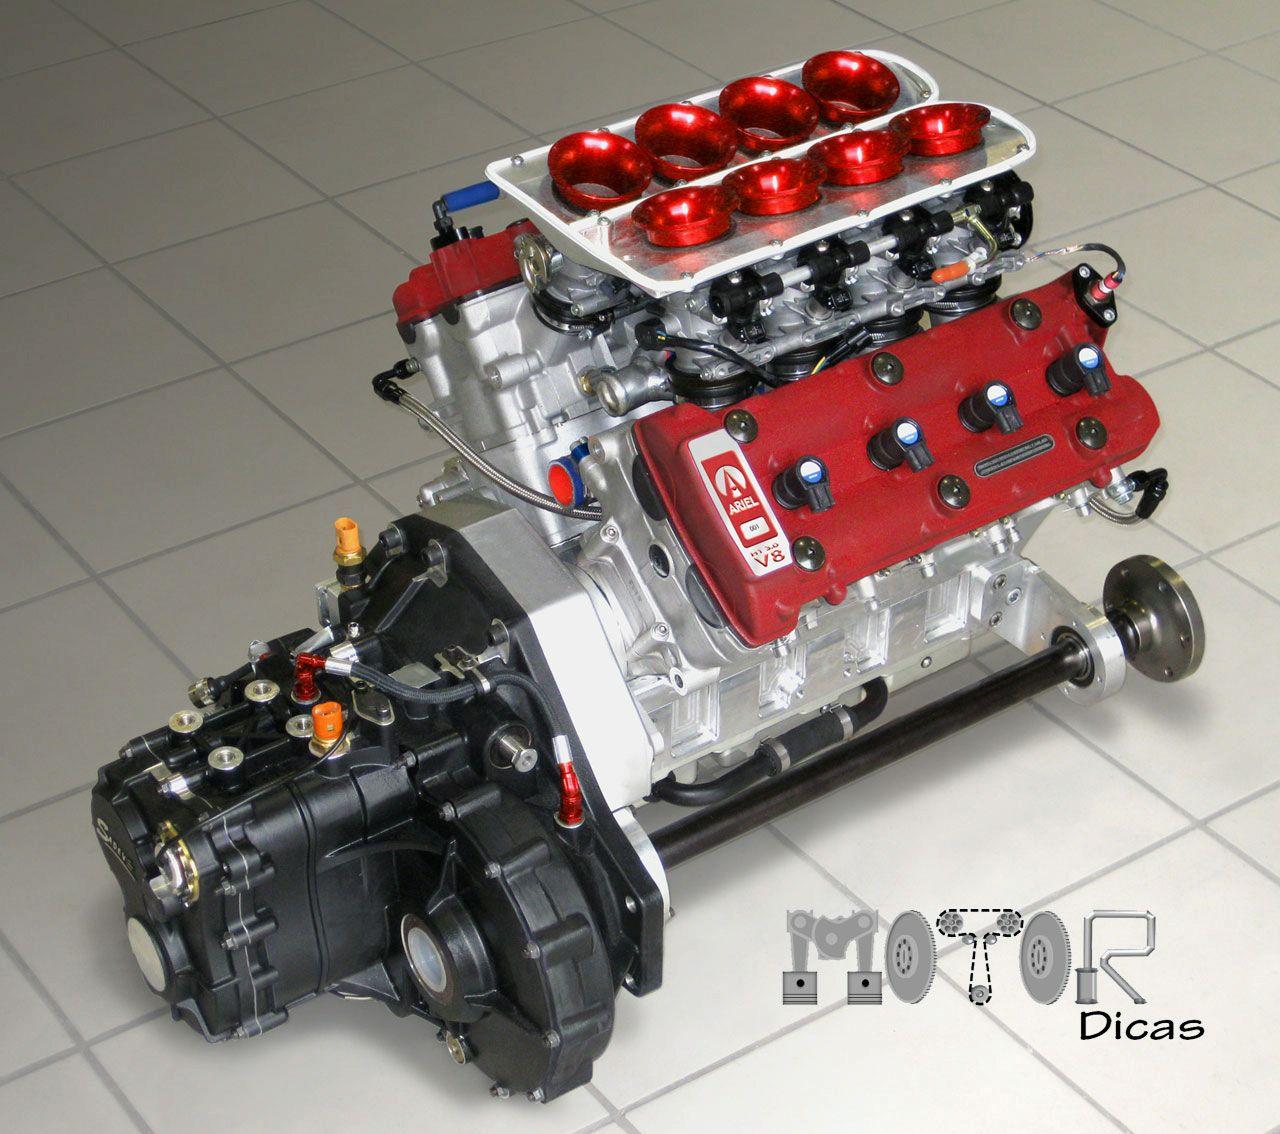 http://3.bp.blogspot.com/-feQSETPiTSU/TbYTPzef-5I/AAAAAAAABJY/4pGLC7awqCk/s1600/ariel-atom-v8-engine.jpg